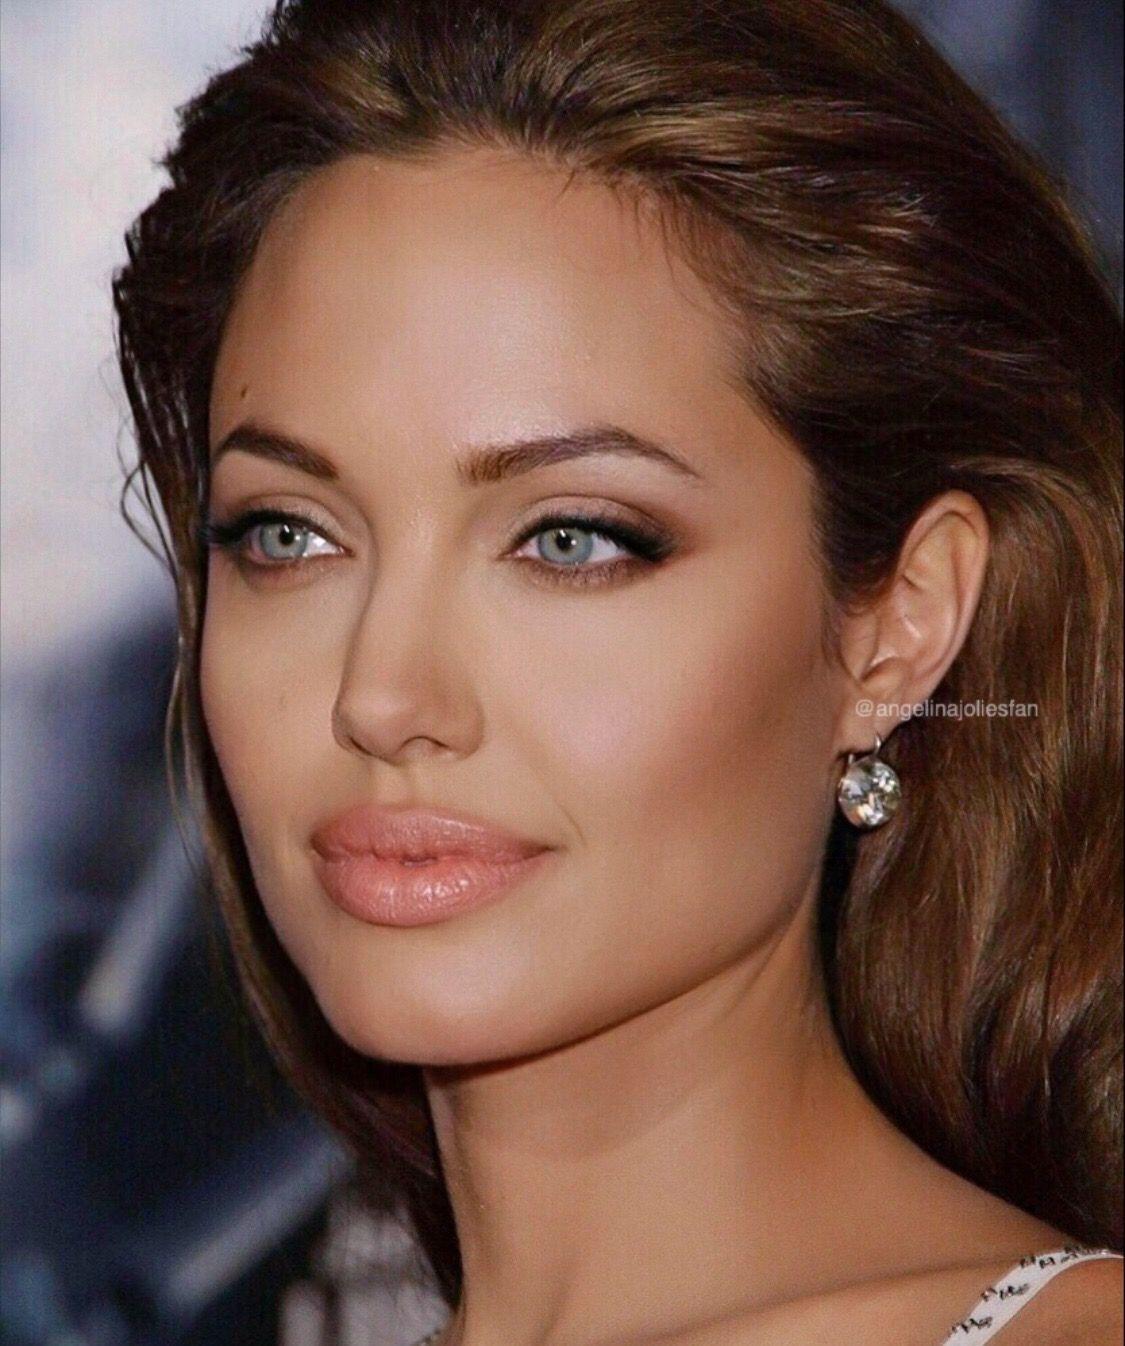 Photo of Angelina Jolie – Angelina Jolie, #Angelina |